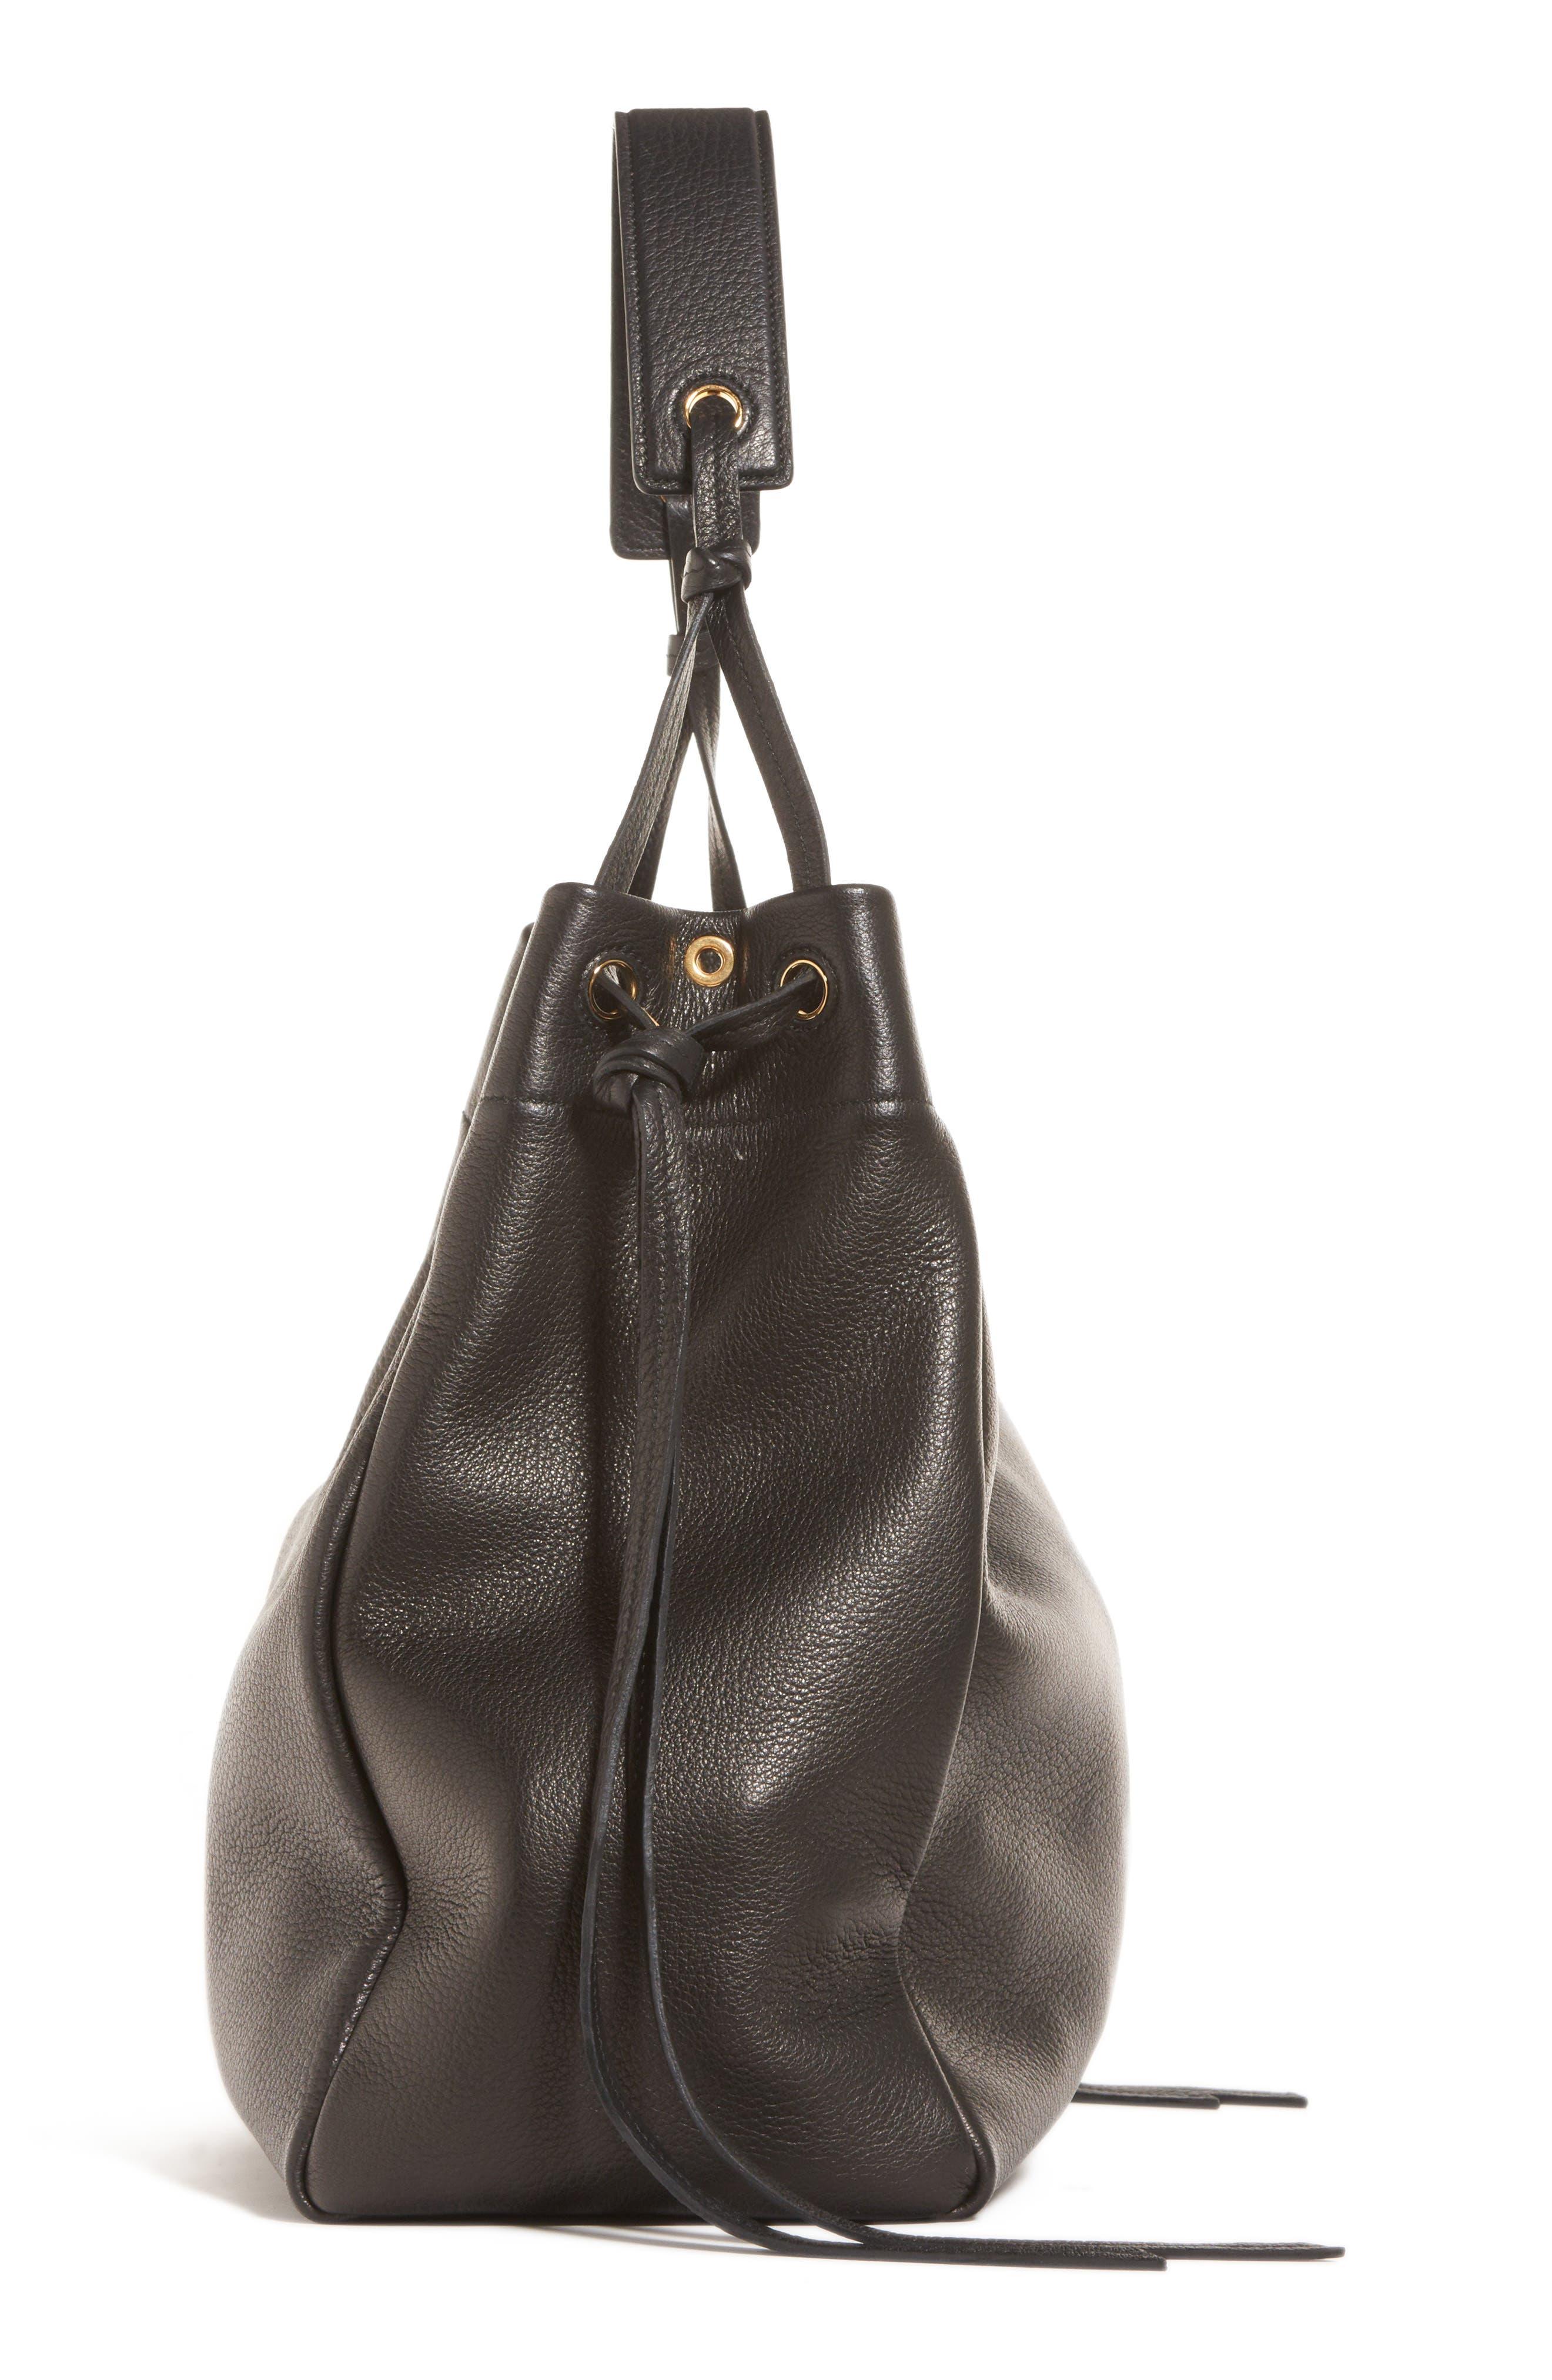 PRADA,                             Large Deerskin Leather Hobo,                             Alternate thumbnail 4, color,                             001